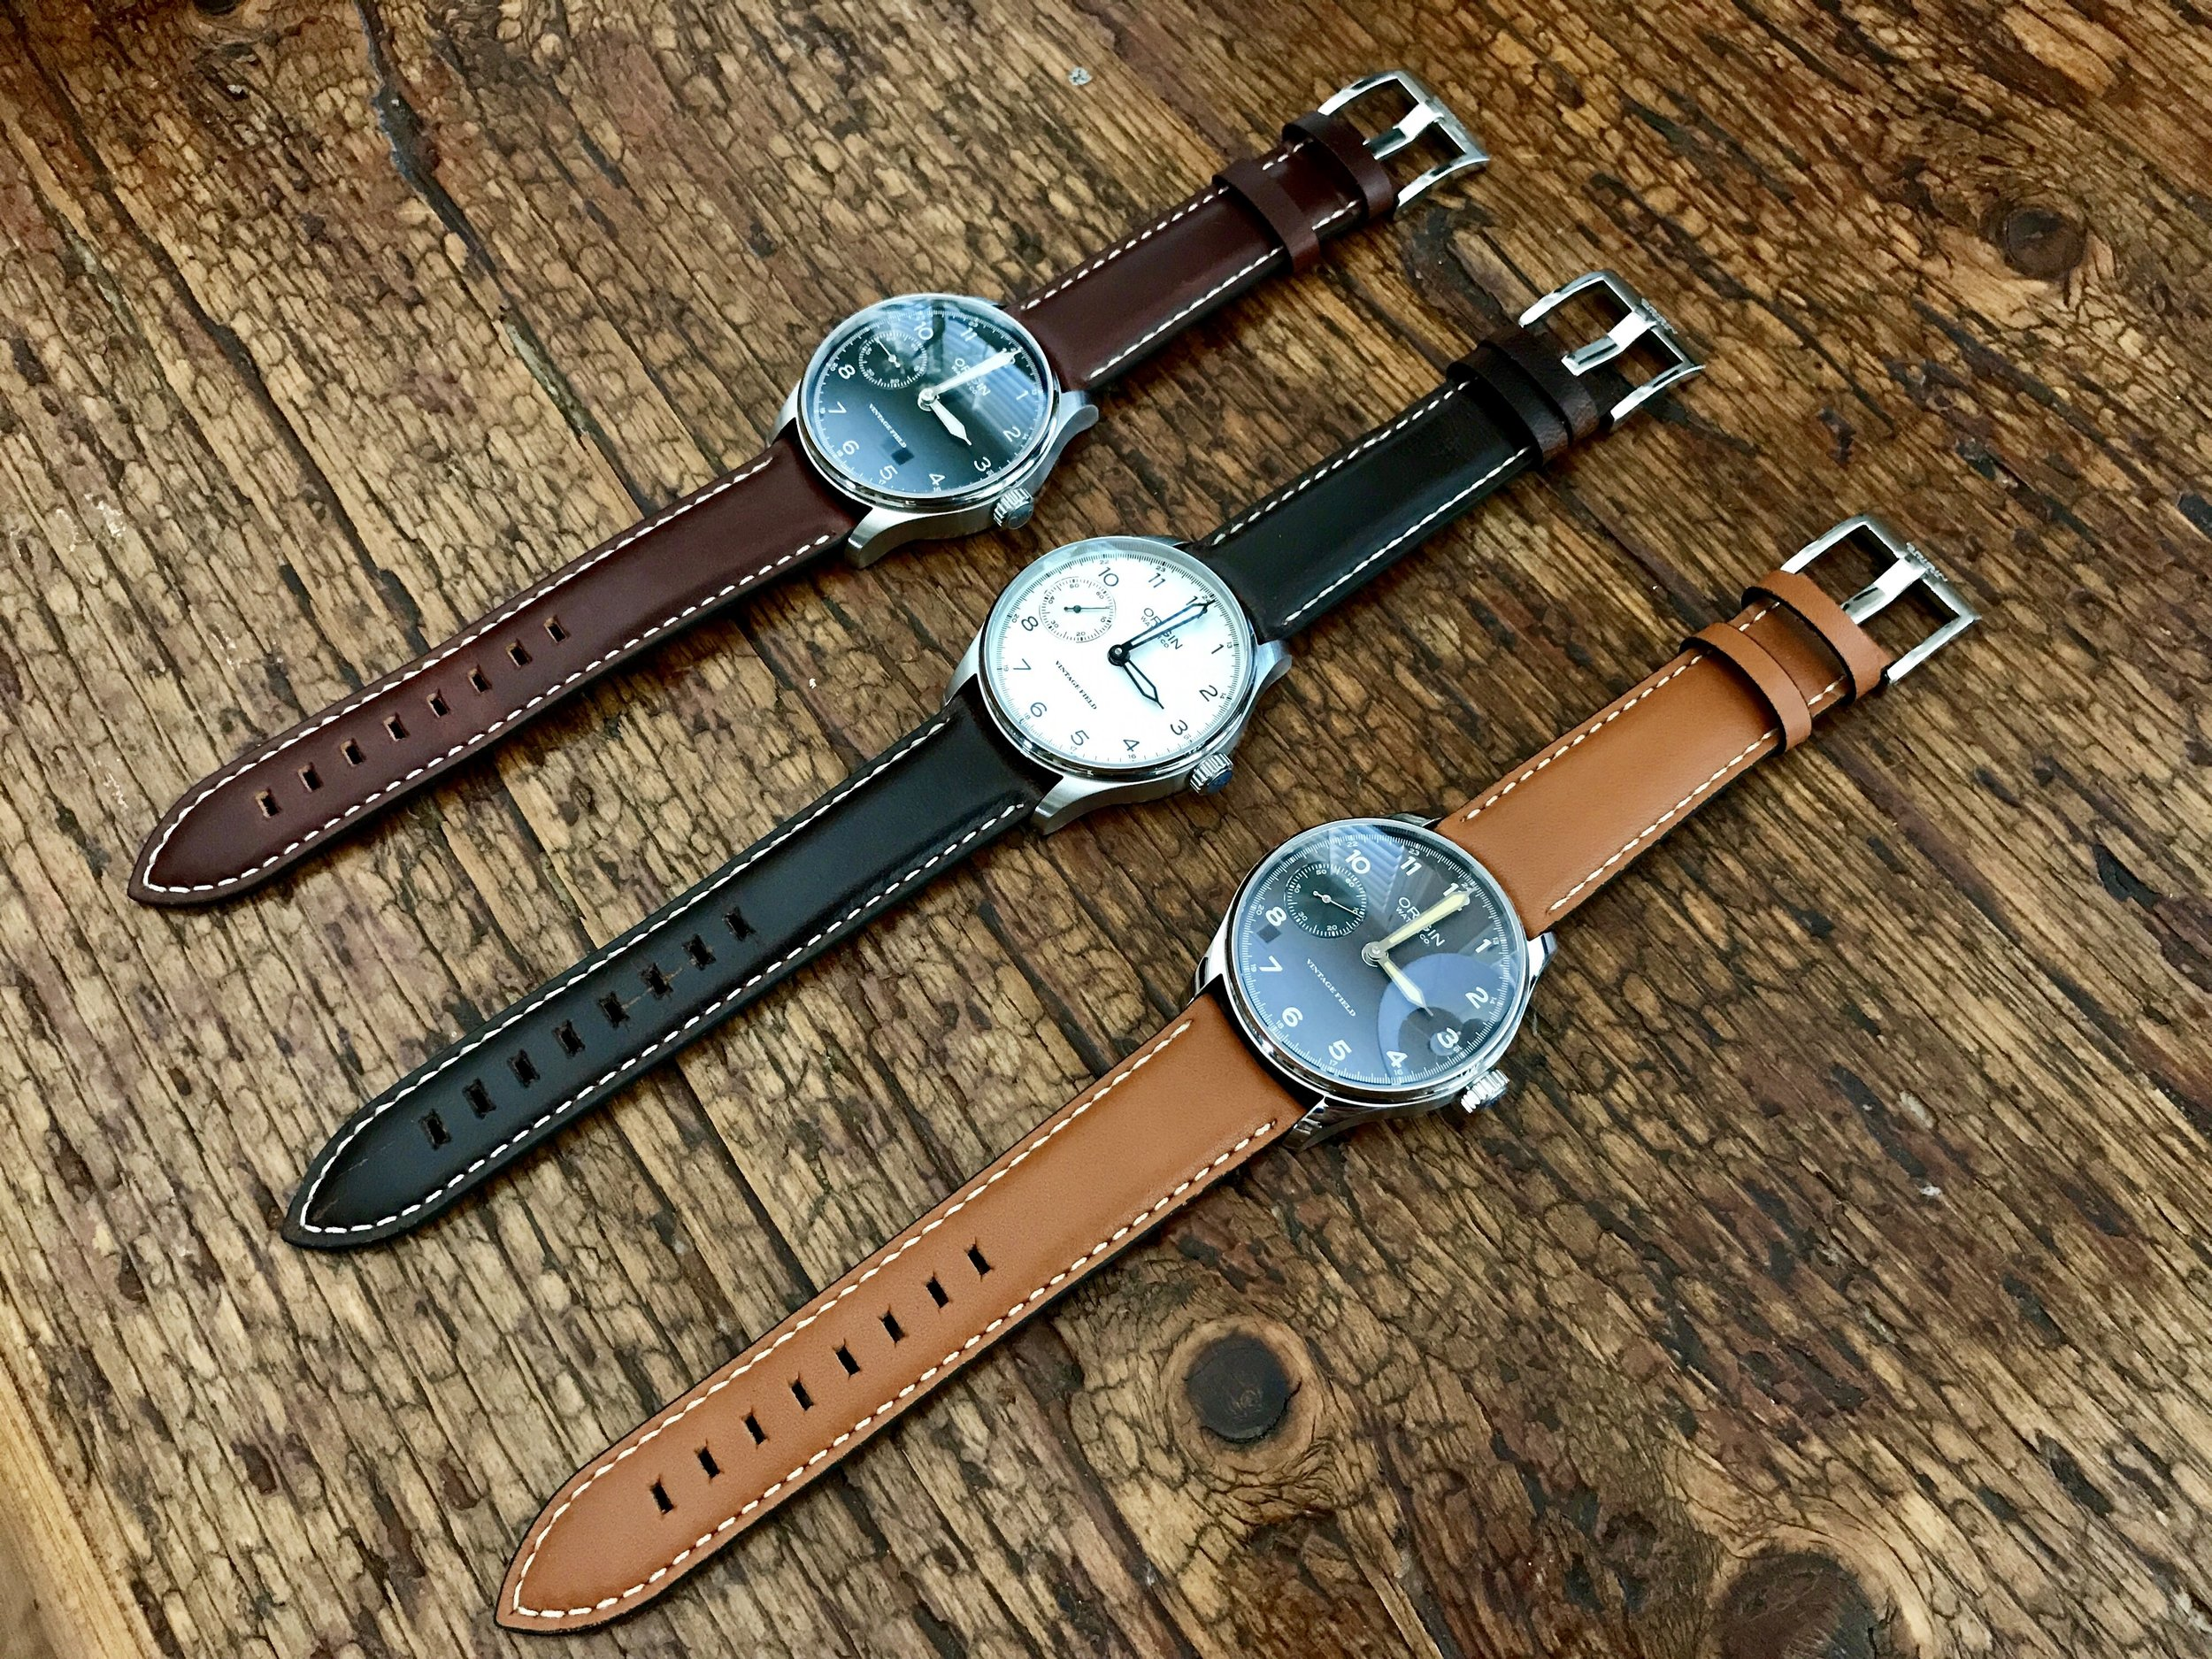 Vintage Field Watch 2nd Edition